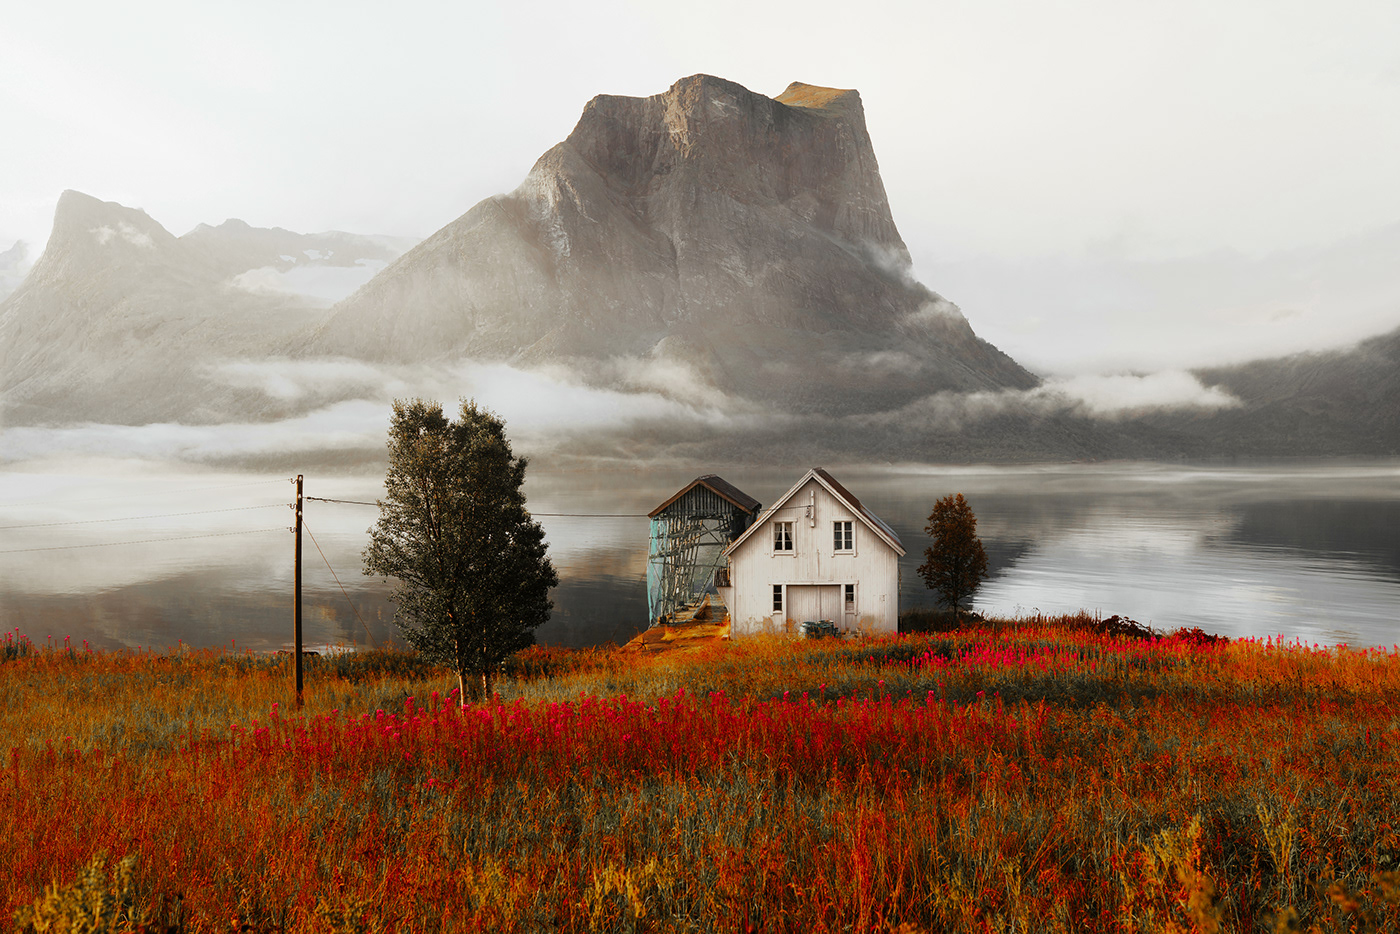 Landscape lofoten mountains Nature north norway outdoors Scandinavia senja summer